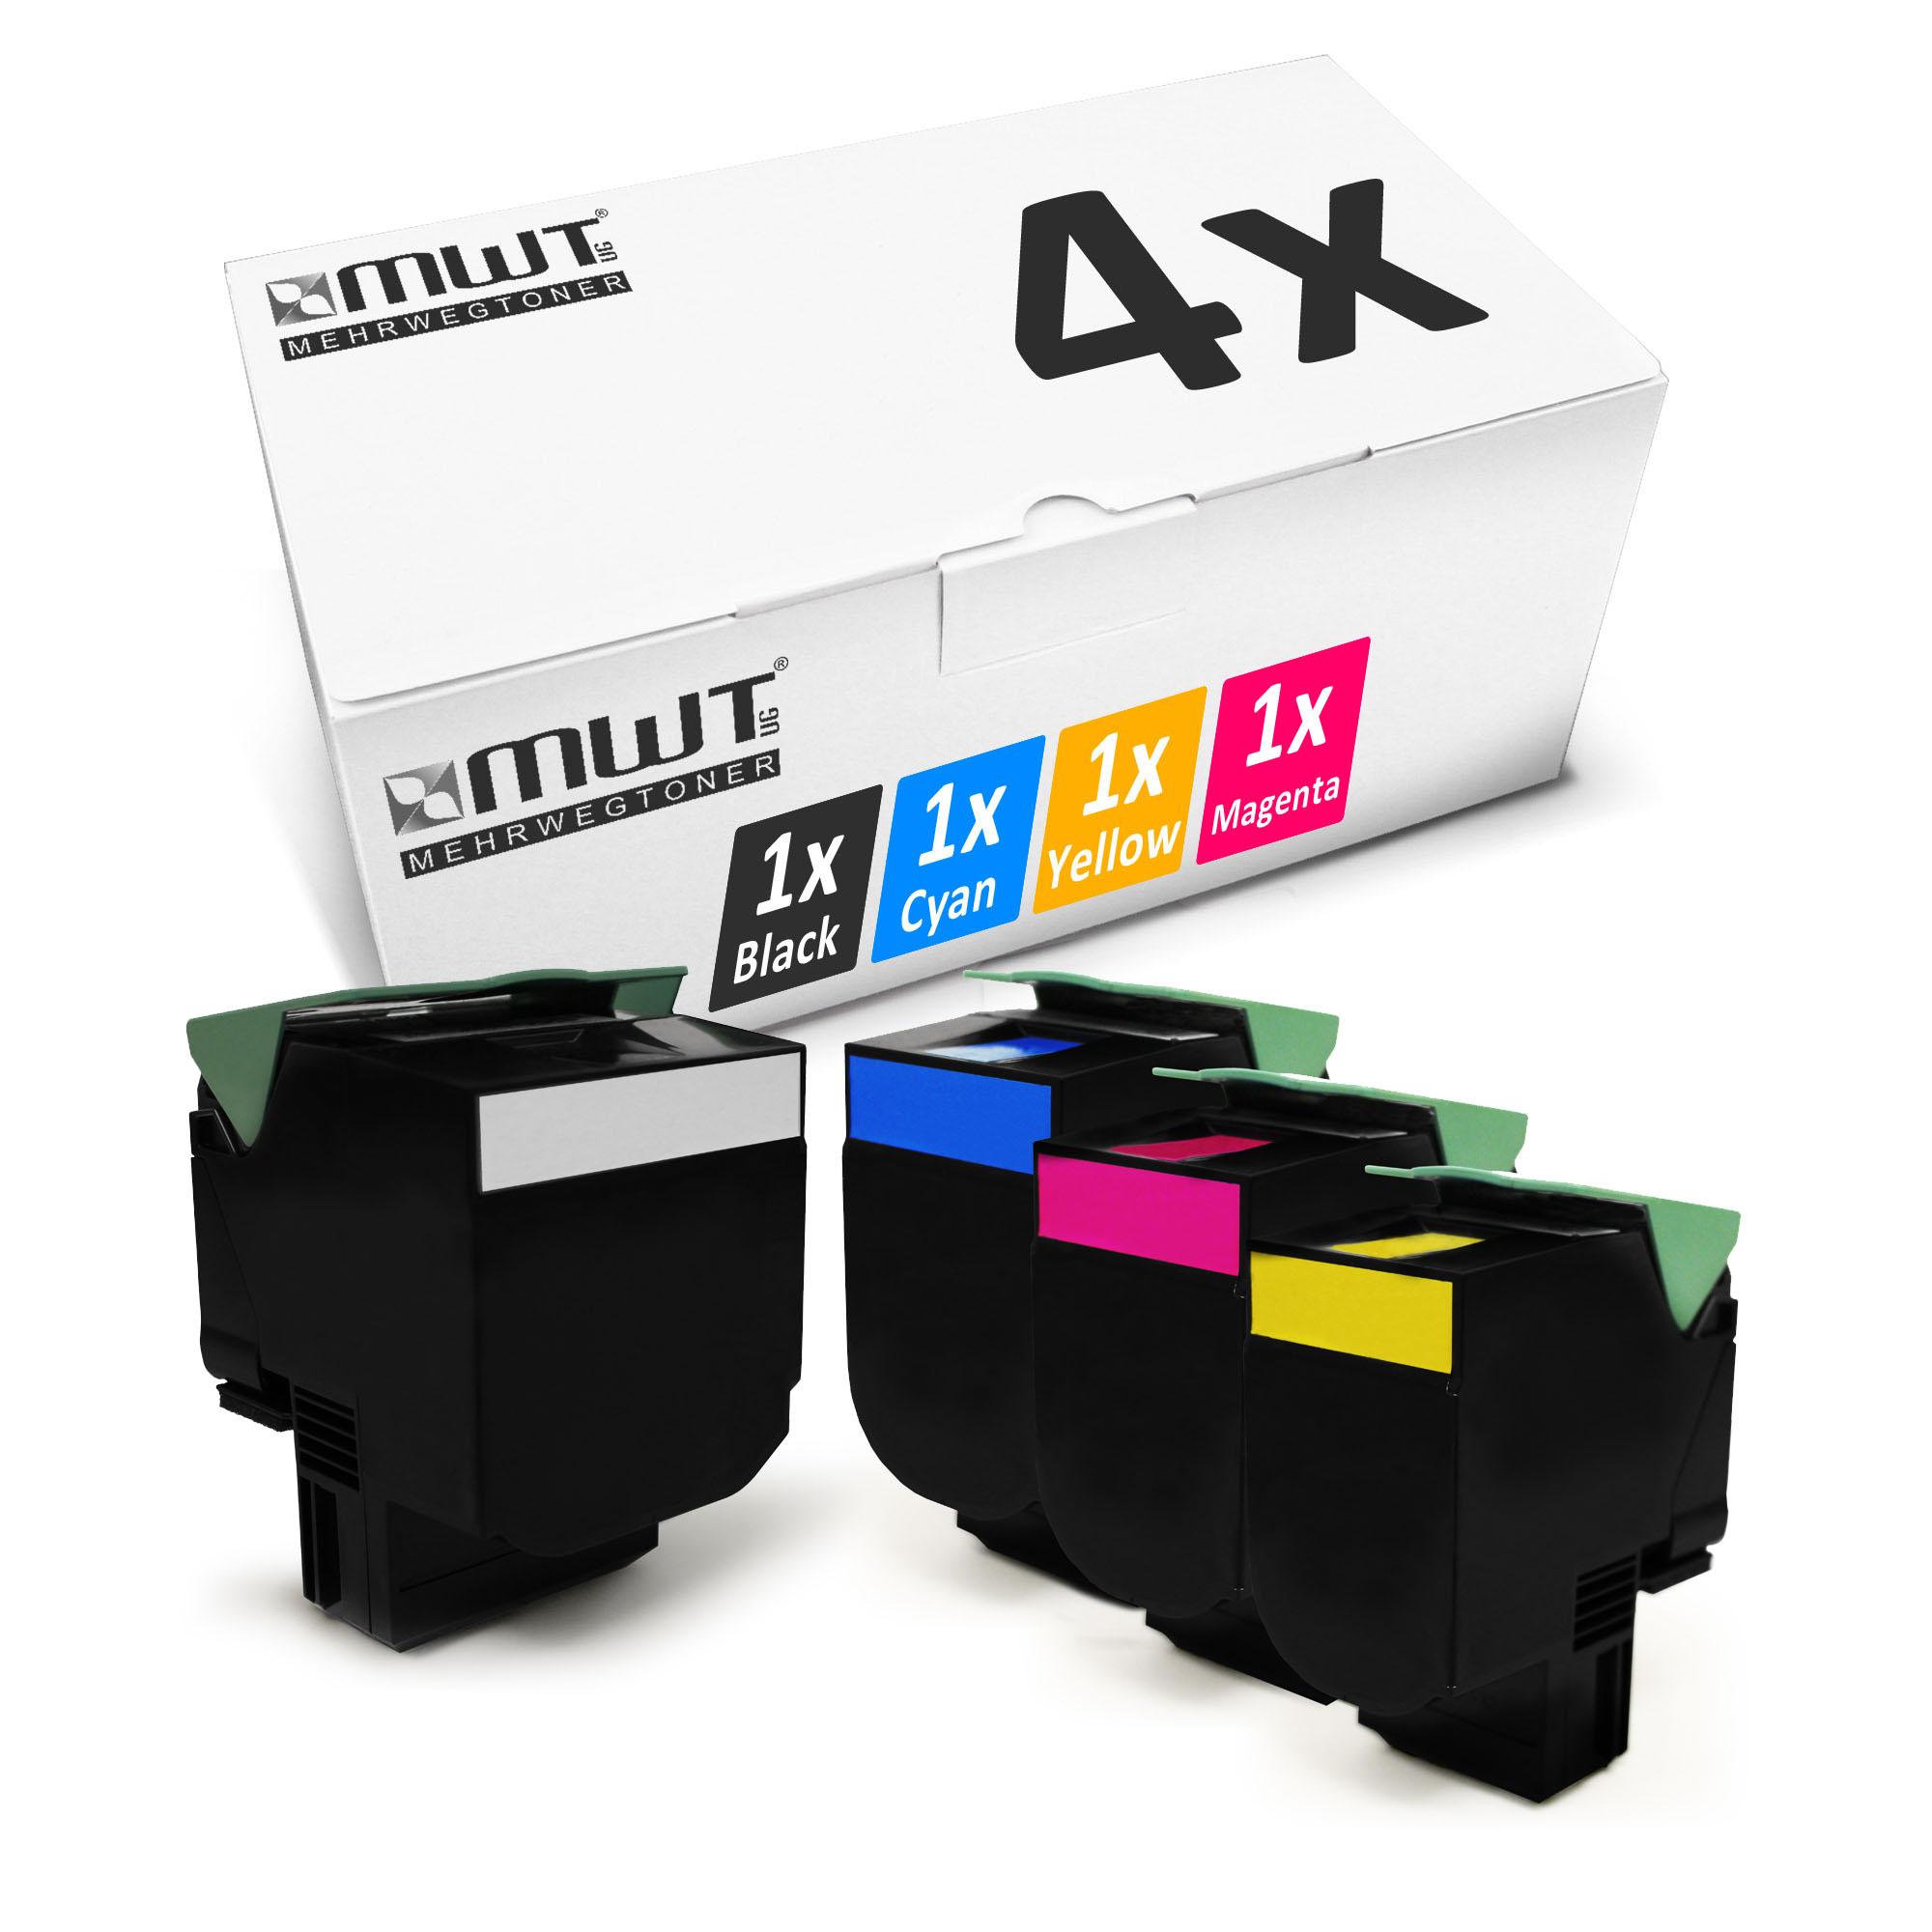 4x-Toner-XXL-Pour-LEXMARK-cs-310-dn-cs-410-dn-cs-410-n-cs-510-dte-cs-410-dtn